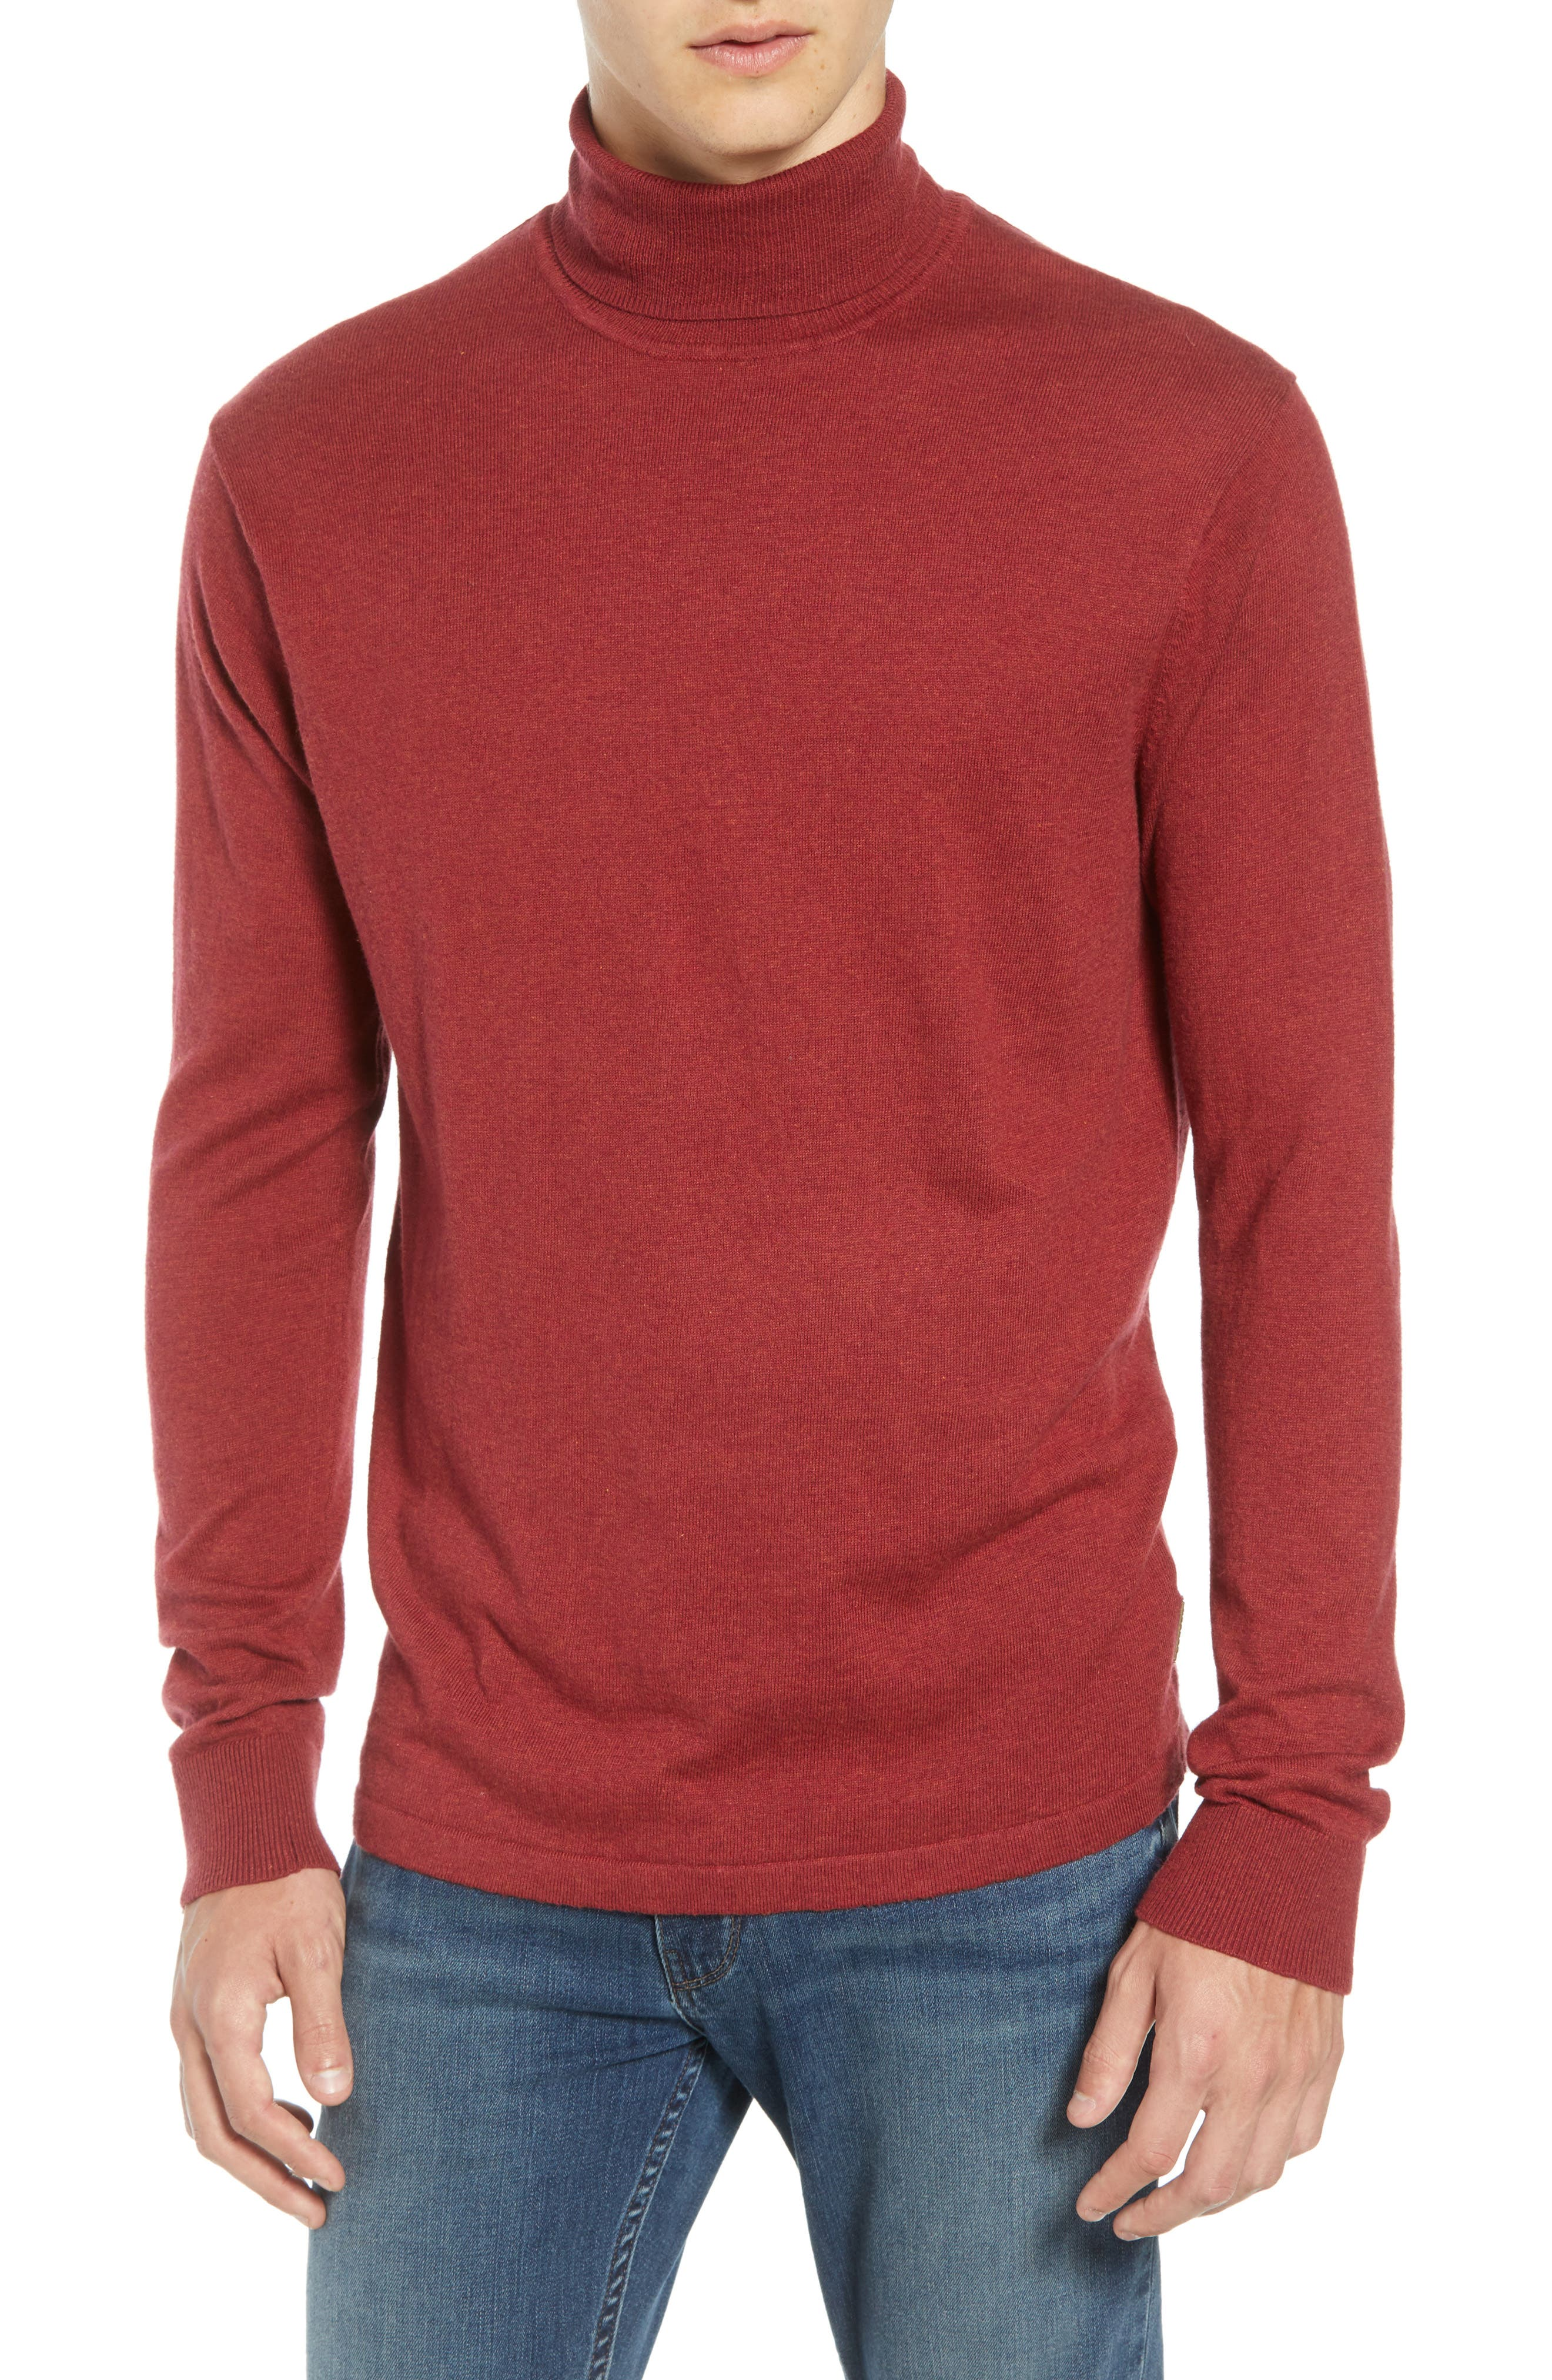 Turtleneck Sweater,                             Main thumbnail 1, color,                             610